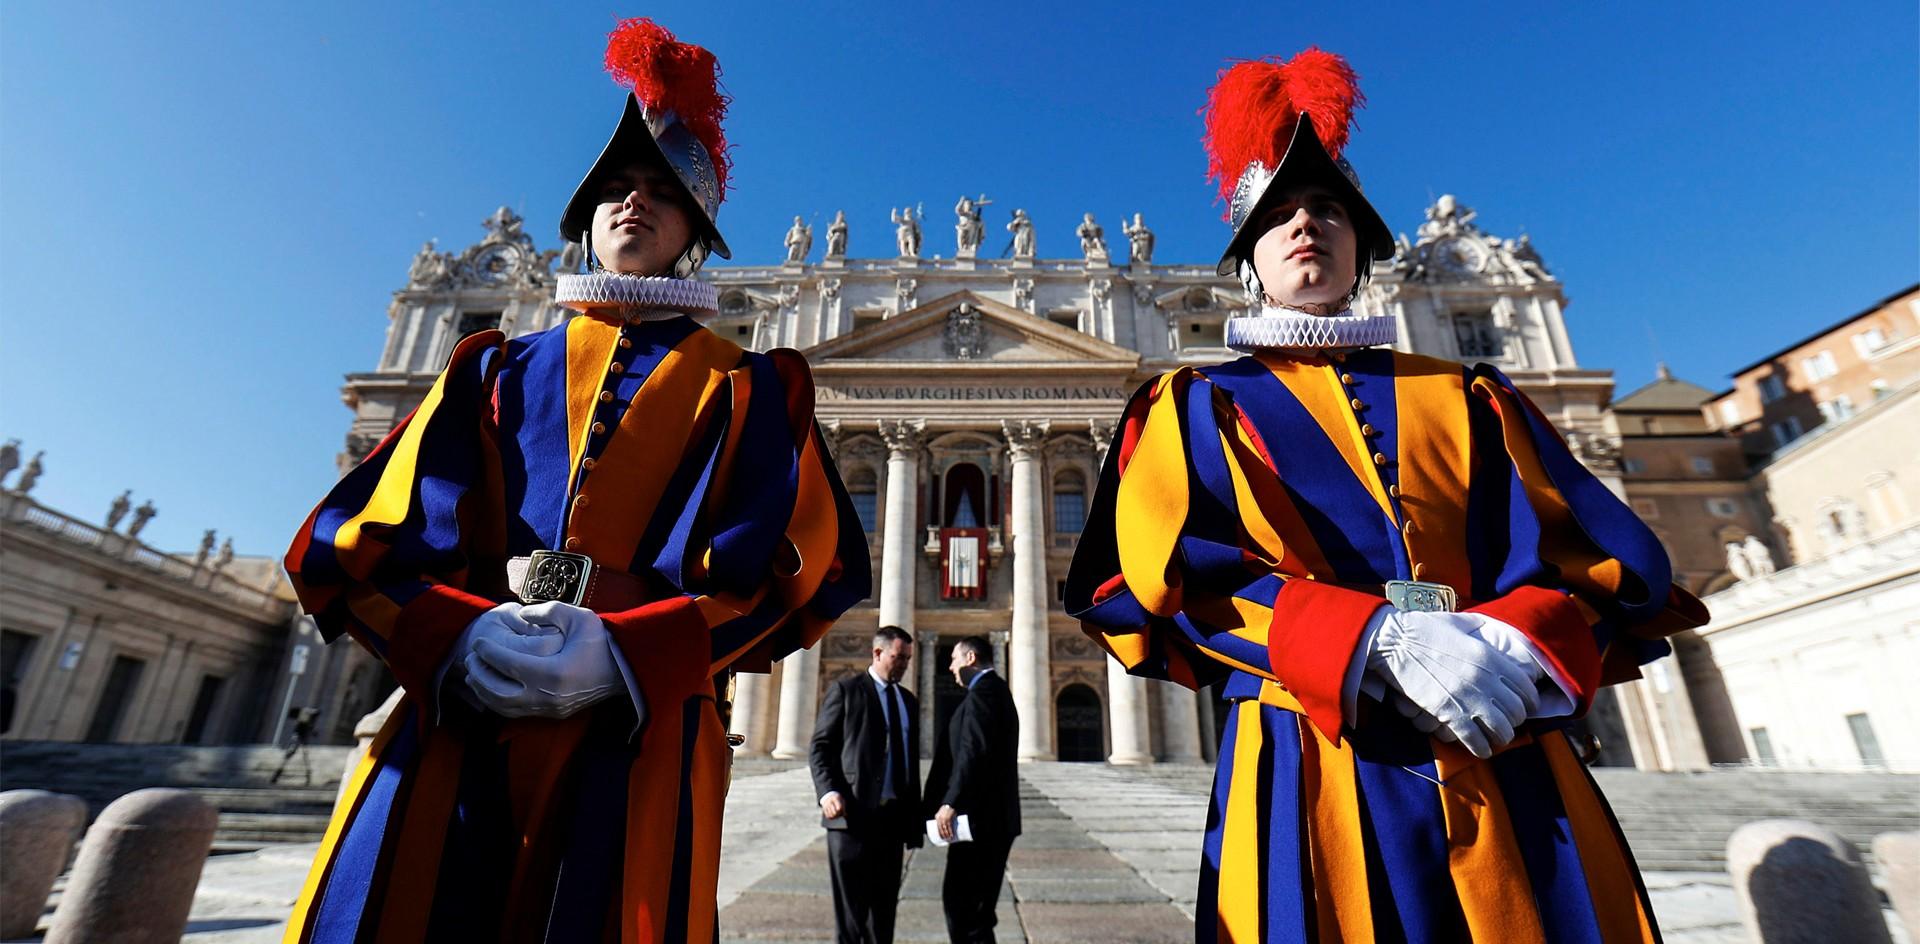 Влиятельному банкиру Святого престола грозит арест